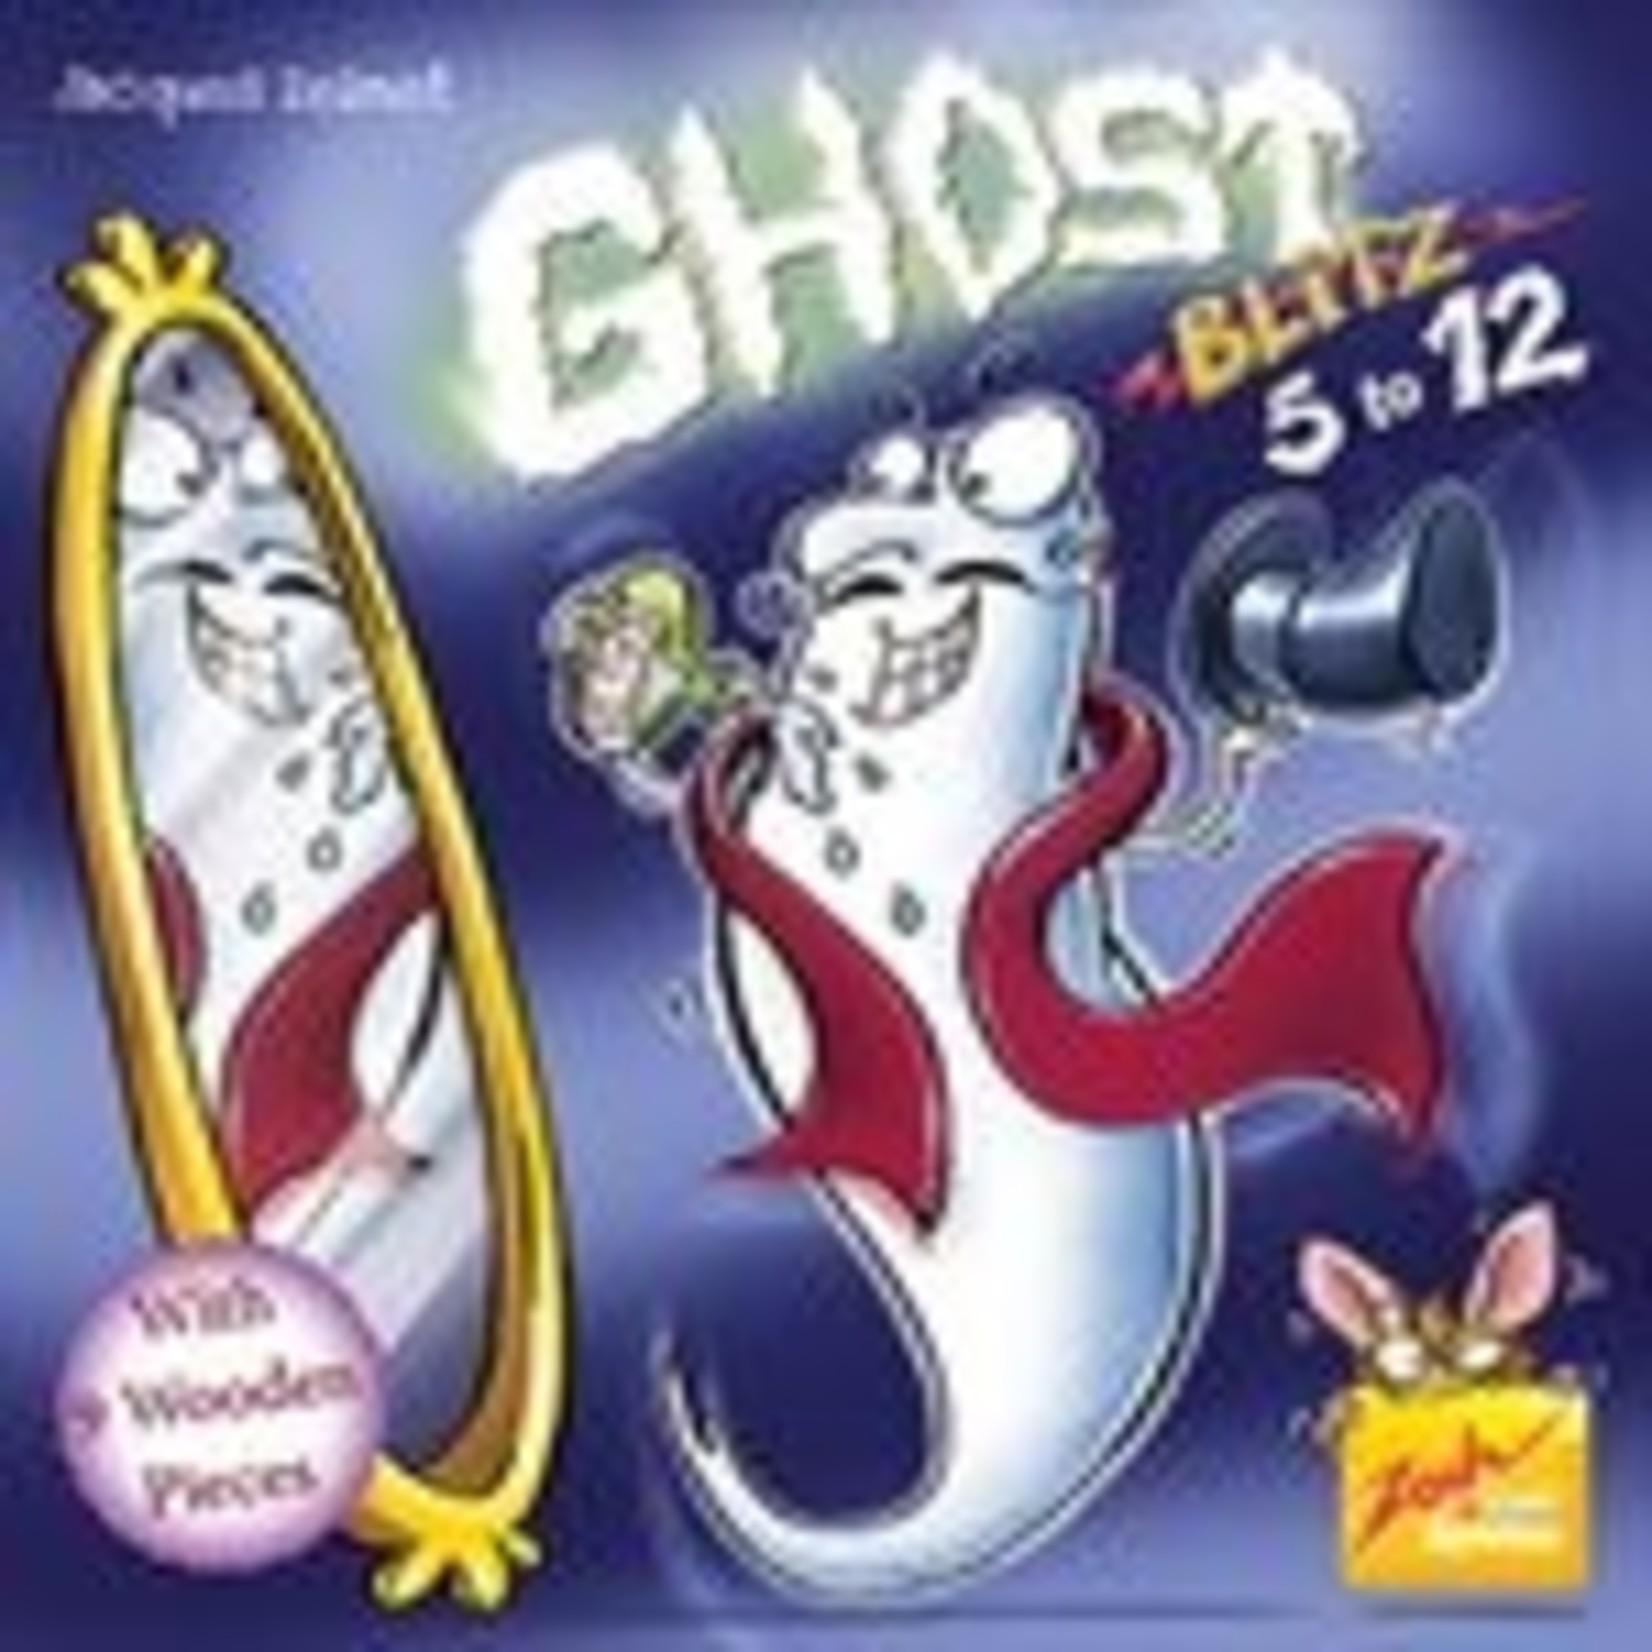 Zoch Verlag Ghost Blitz 5 to 12